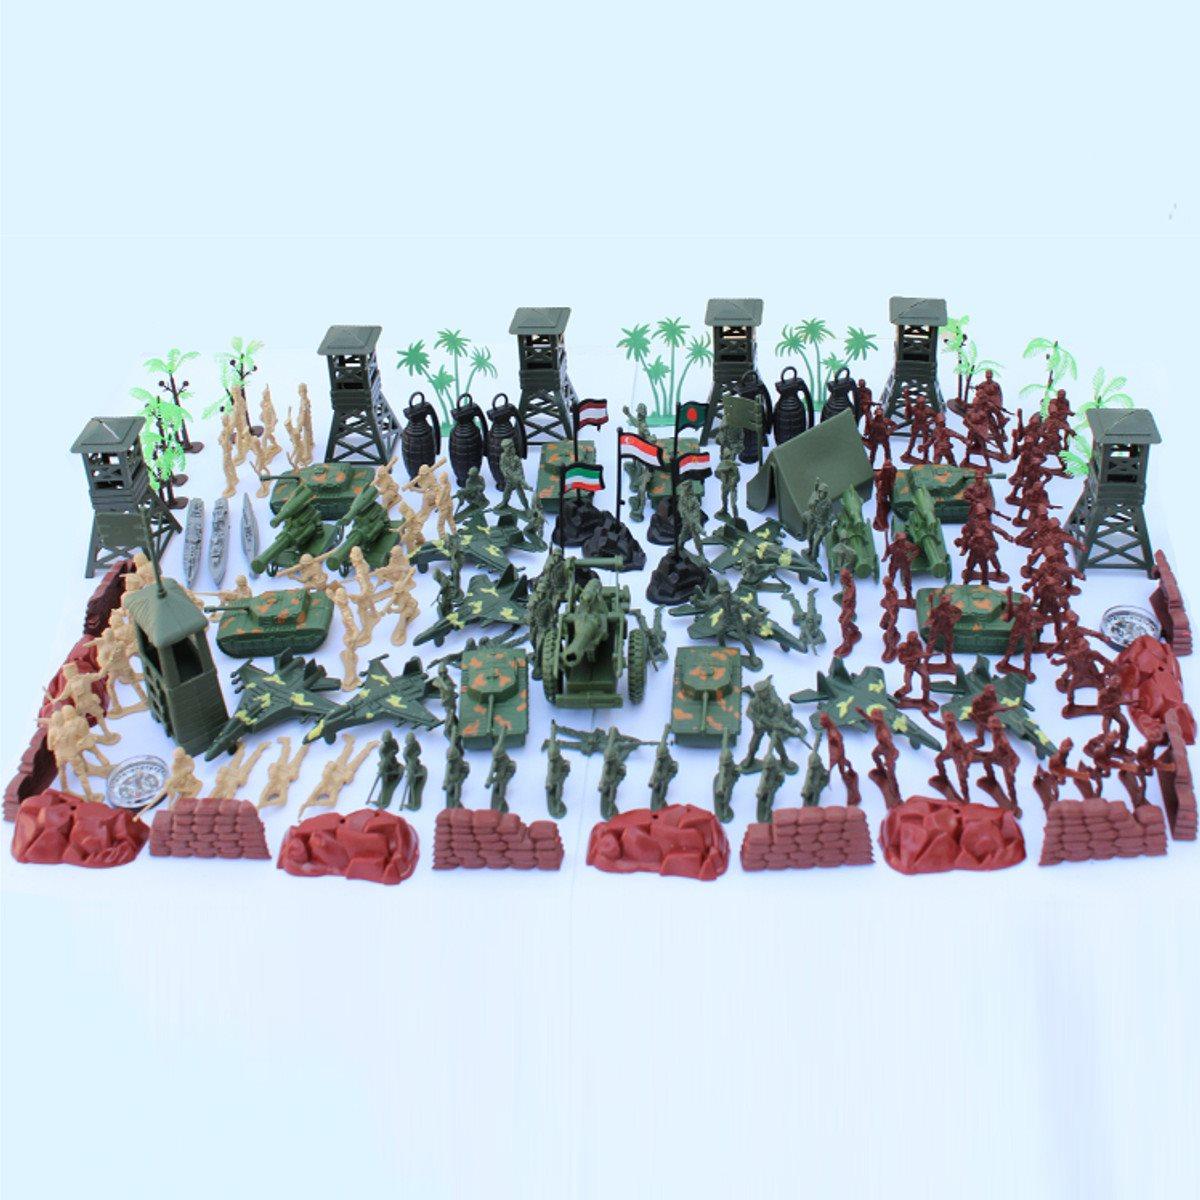 170pcs/set Military Plastic Model Toy Soldier Army Men Figures & Accessories Playset Kit Decor Gift Model Toys For Children bwl 01 tyrannosaurus dinosaur skeleton model excavation archaeology toy kit white